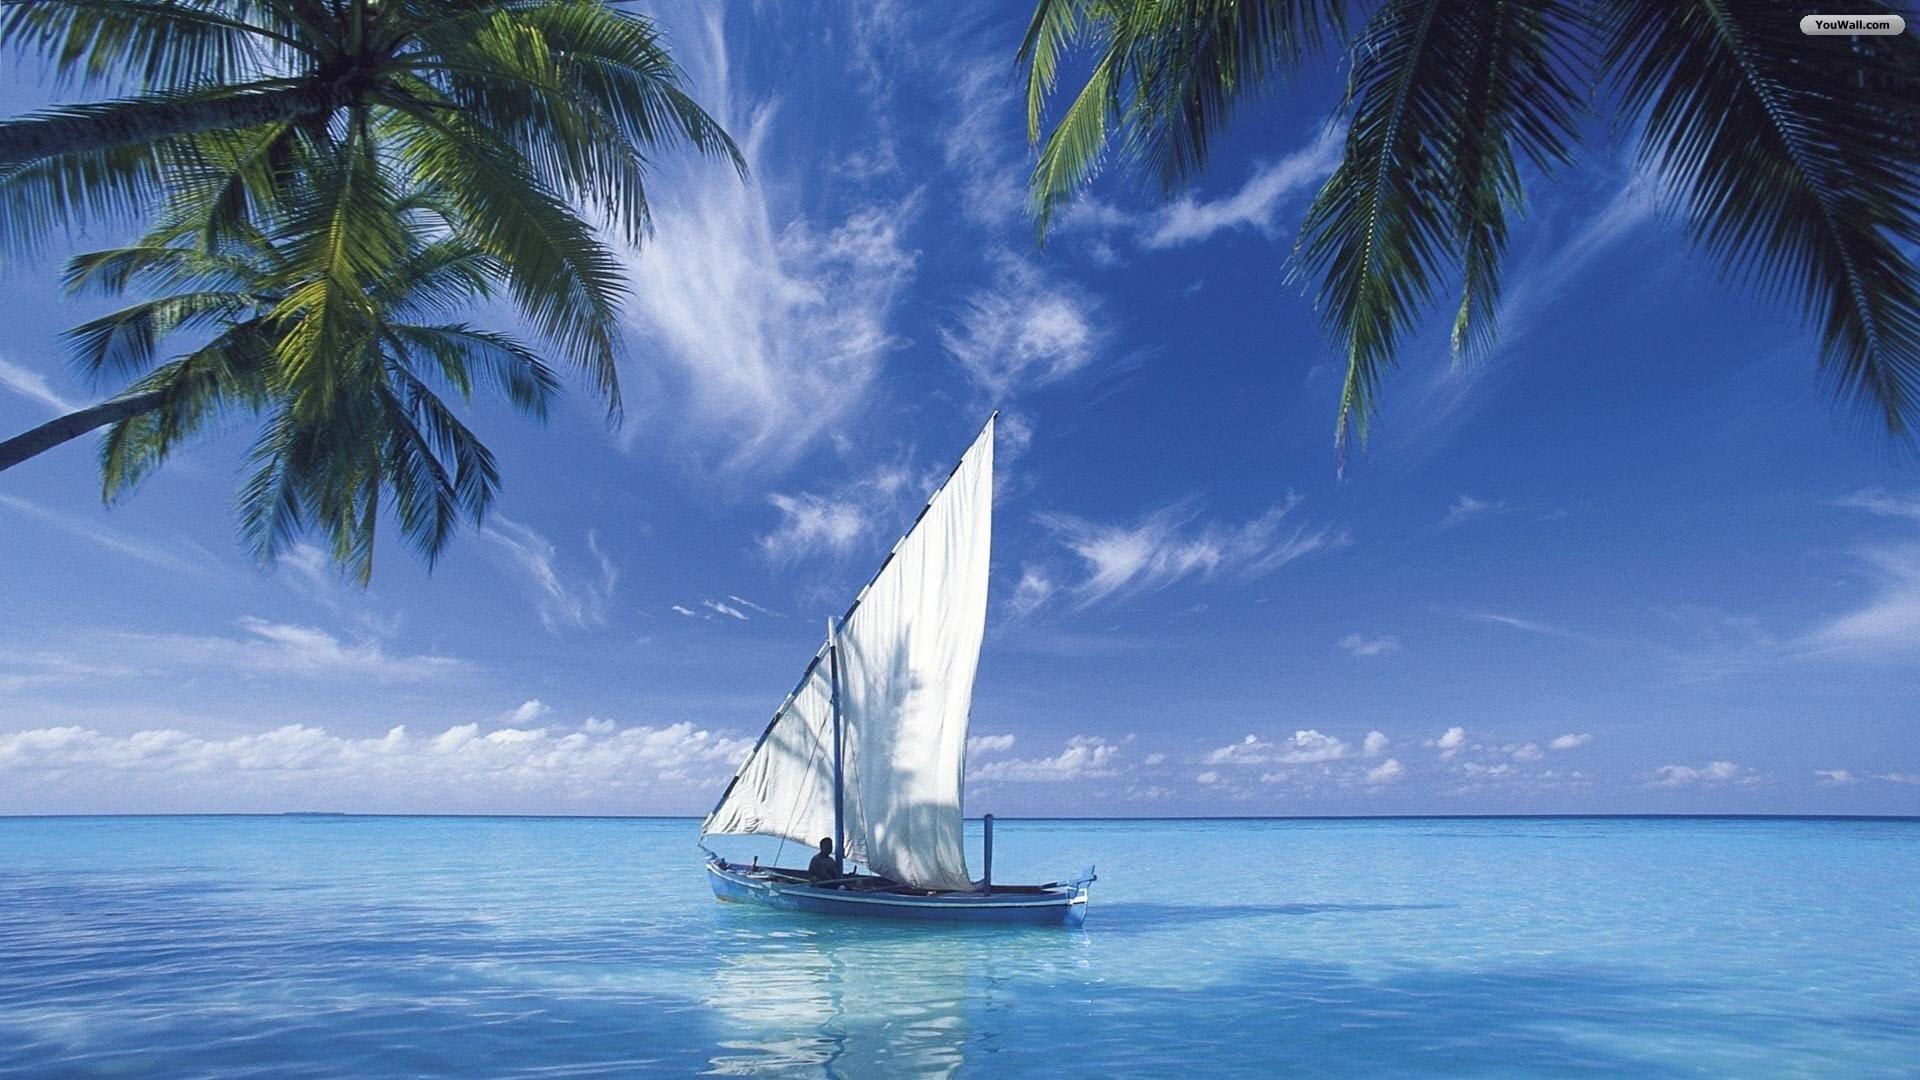 Sea Wallpaper image hd